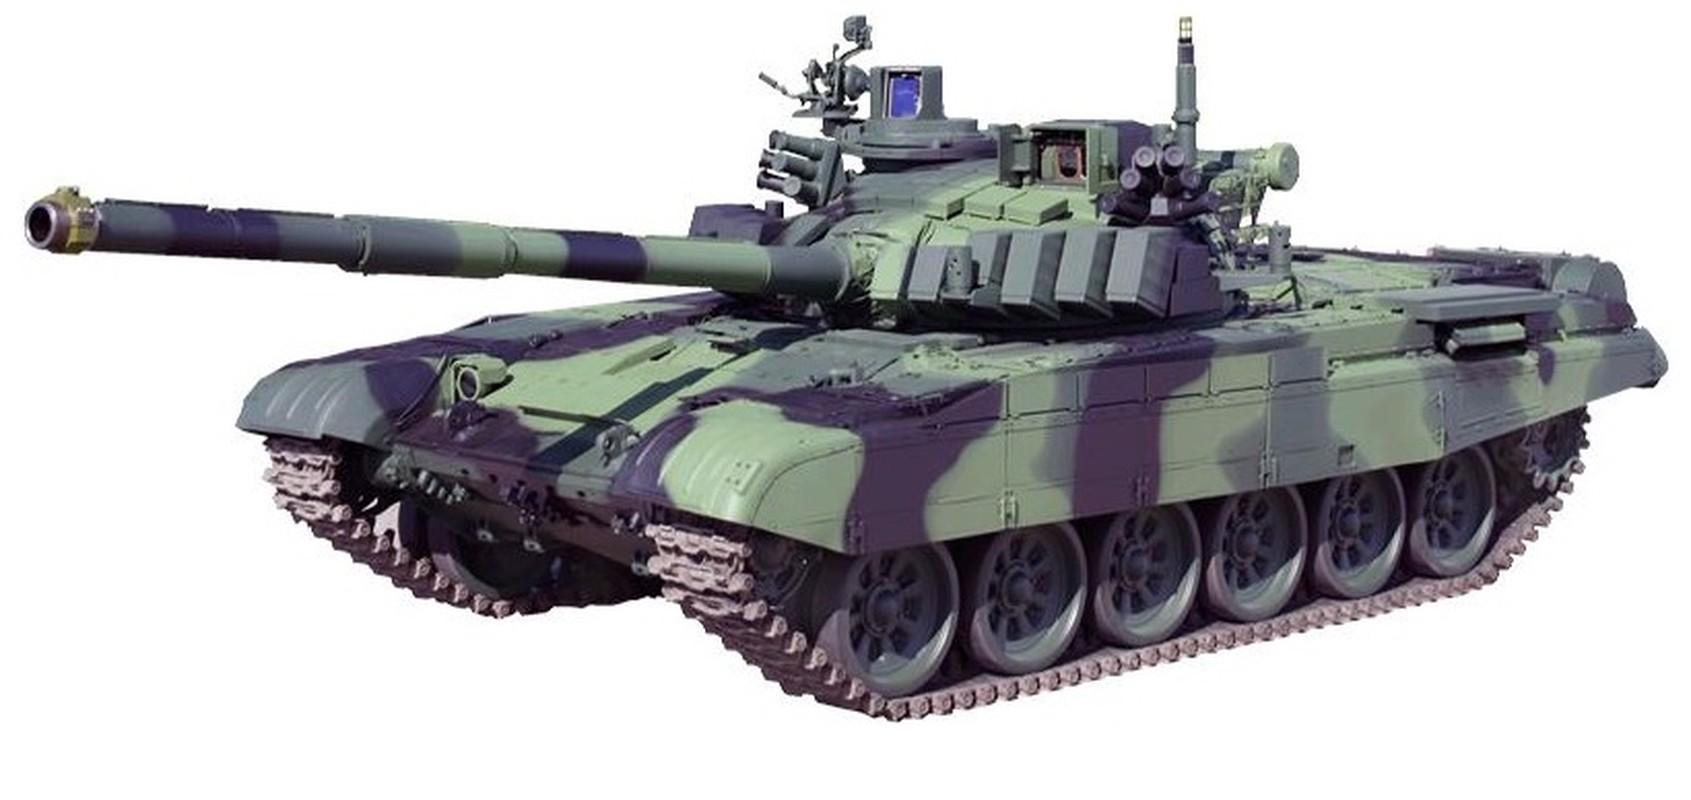 Bat ngo: Sec hien dai hoa xe tang T-72 con tot hon Nga